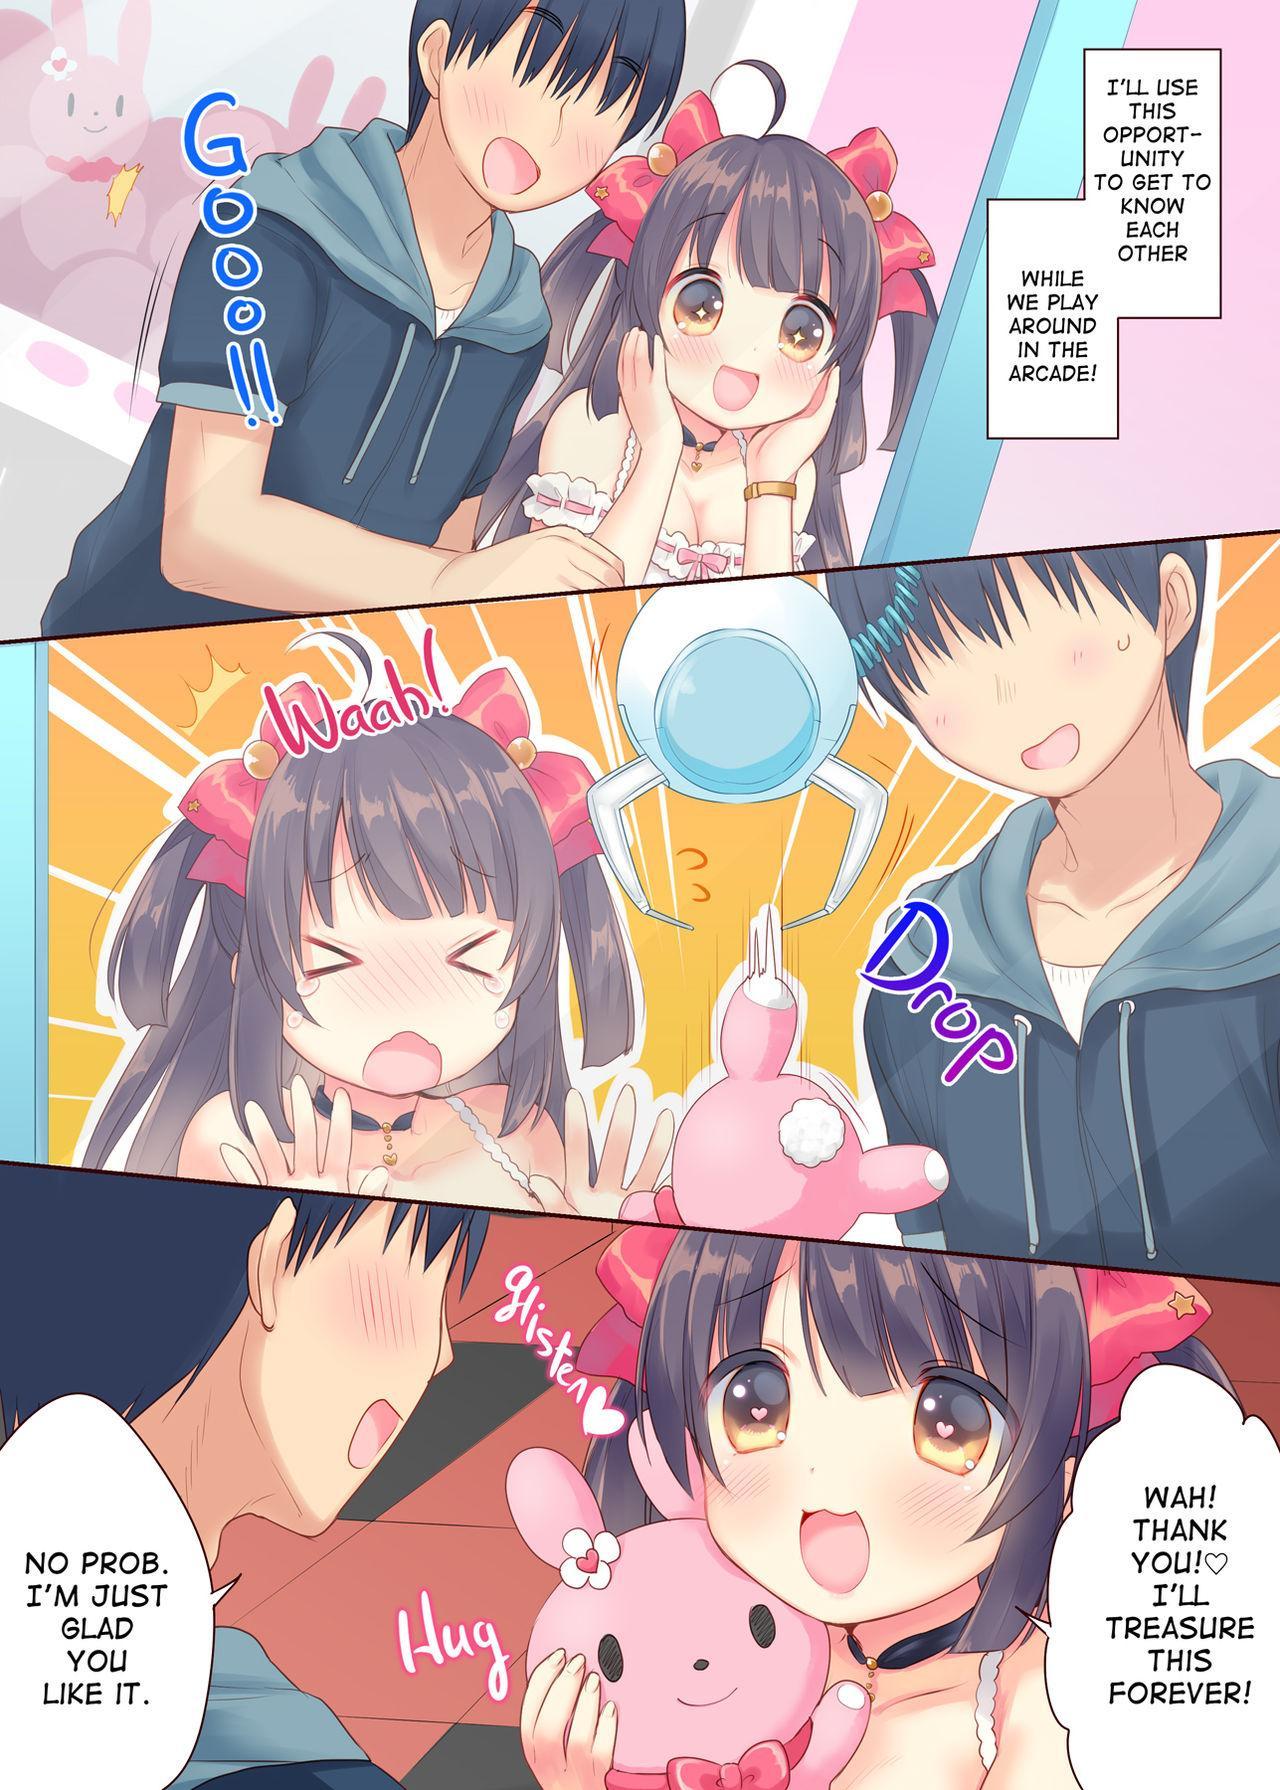 [Triangle! (Usashiro Mani)] GaCen Hime to DT Otoko no Ichaicha Kozukuri Love Sex   Arcade Princess And a Virgin Boy Who Make Out And Have Lovey-Dovey Baby-Making Sex [English] [2d-market.com] [Decensored] [Digital] 5